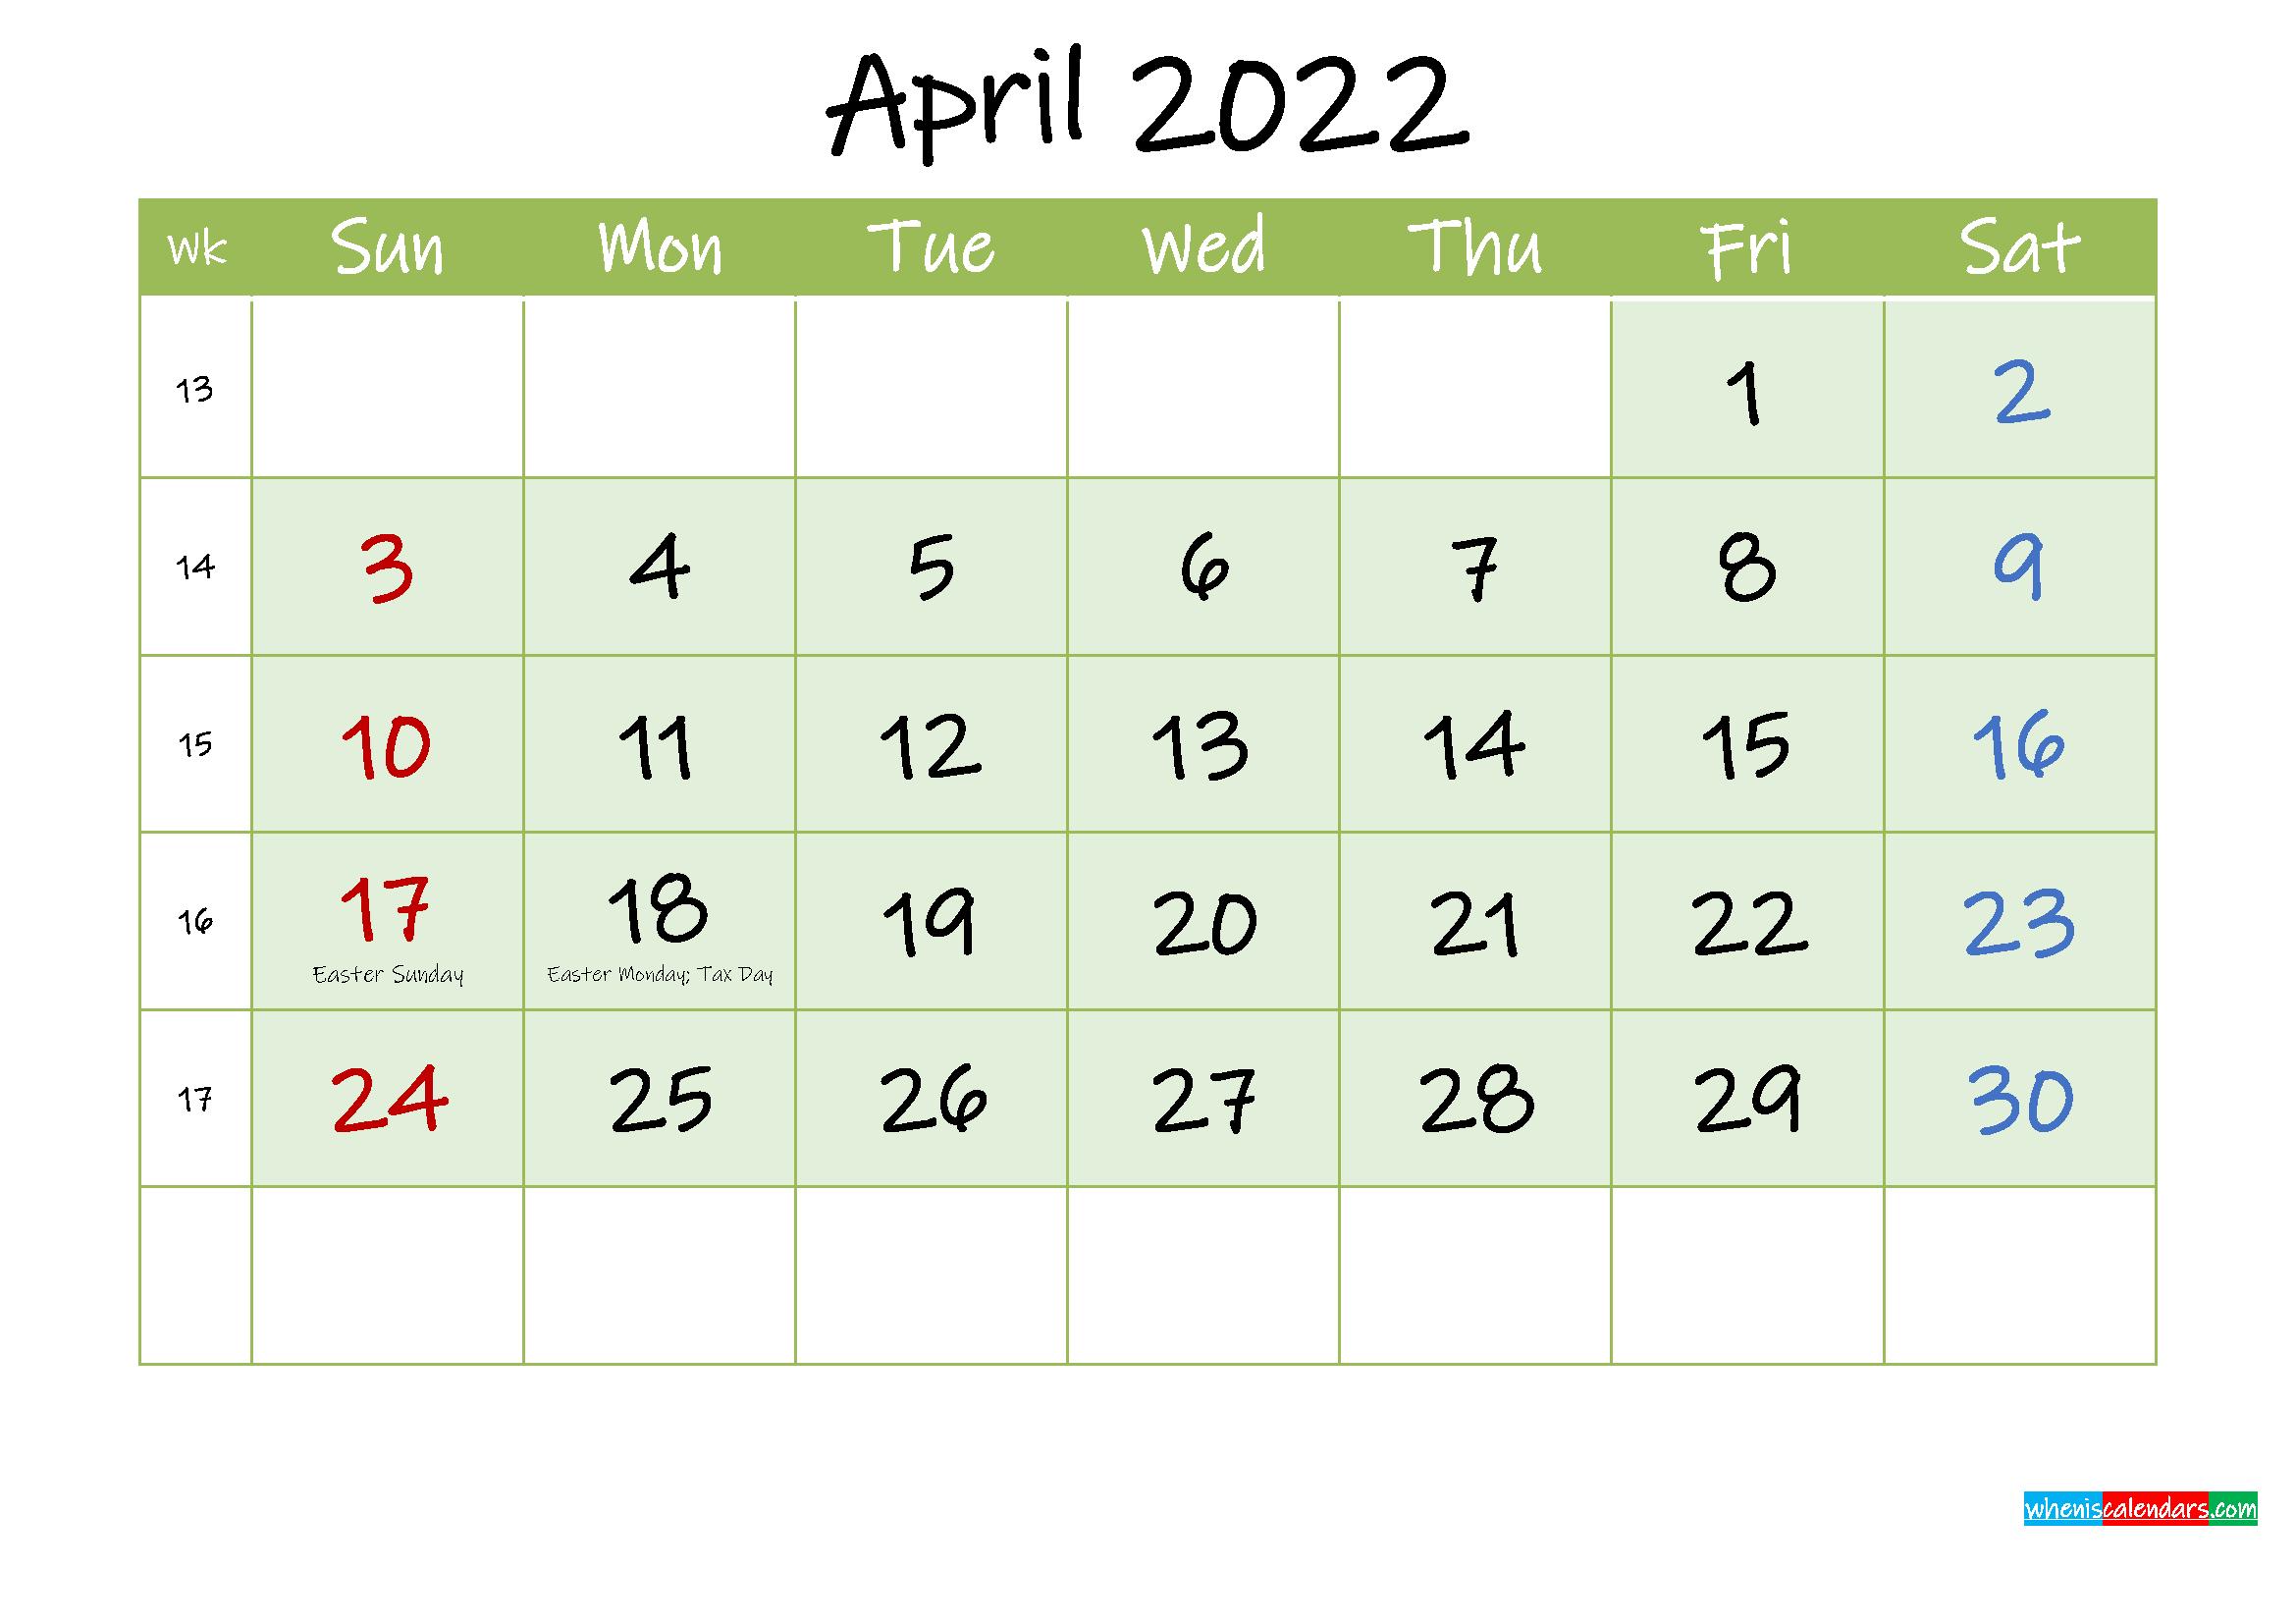 April 2022 Free Printable Calendar - Template Ink22M124